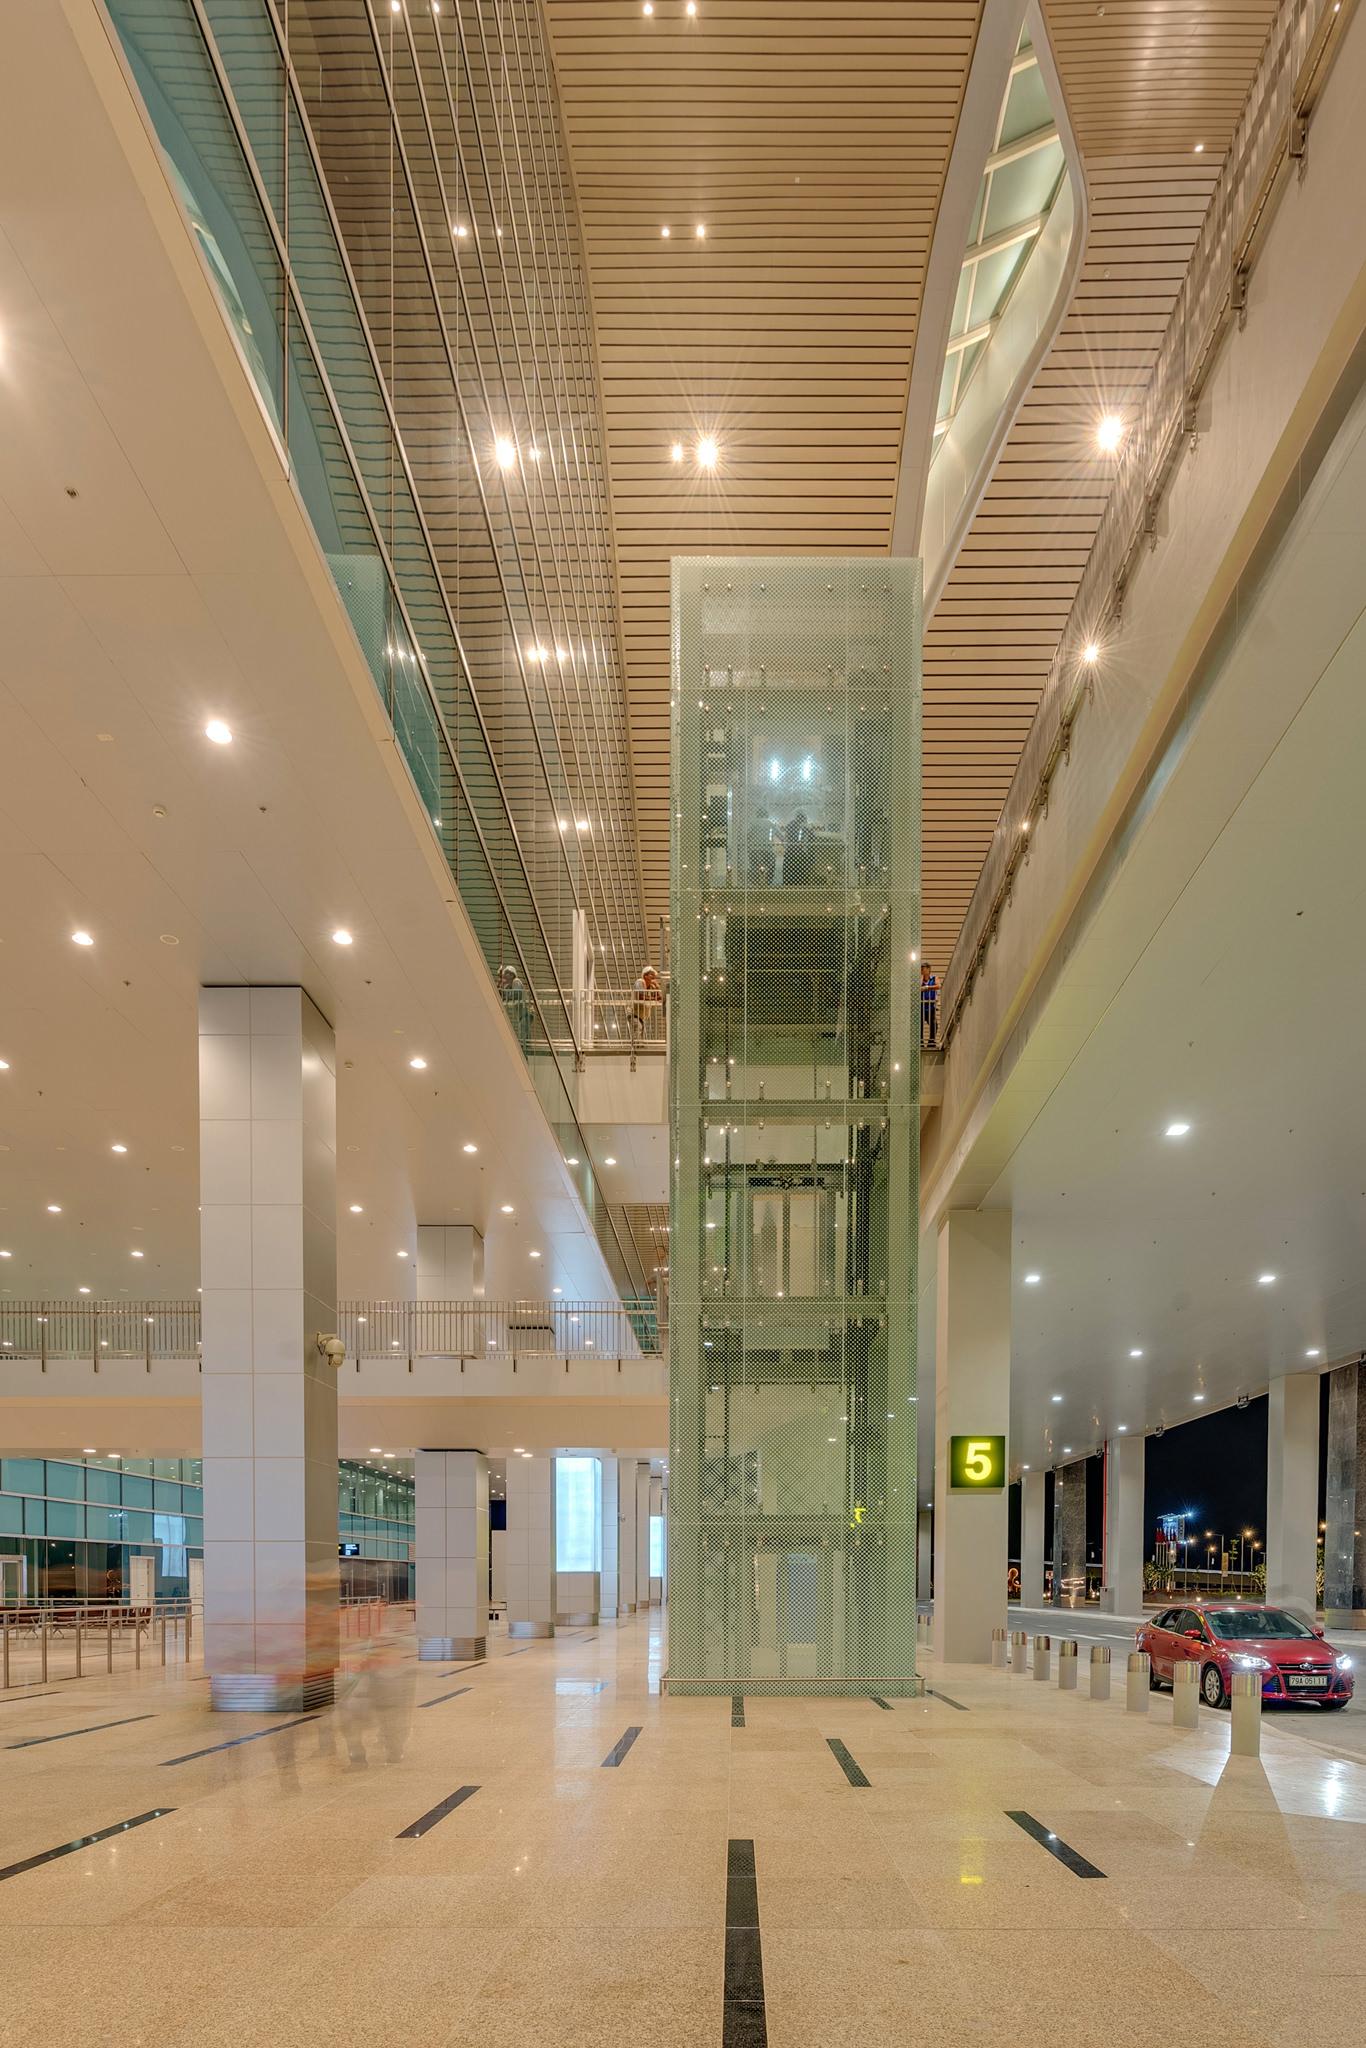 20180626 - Cam Ranh Airport - Architecture - 0429.jpg